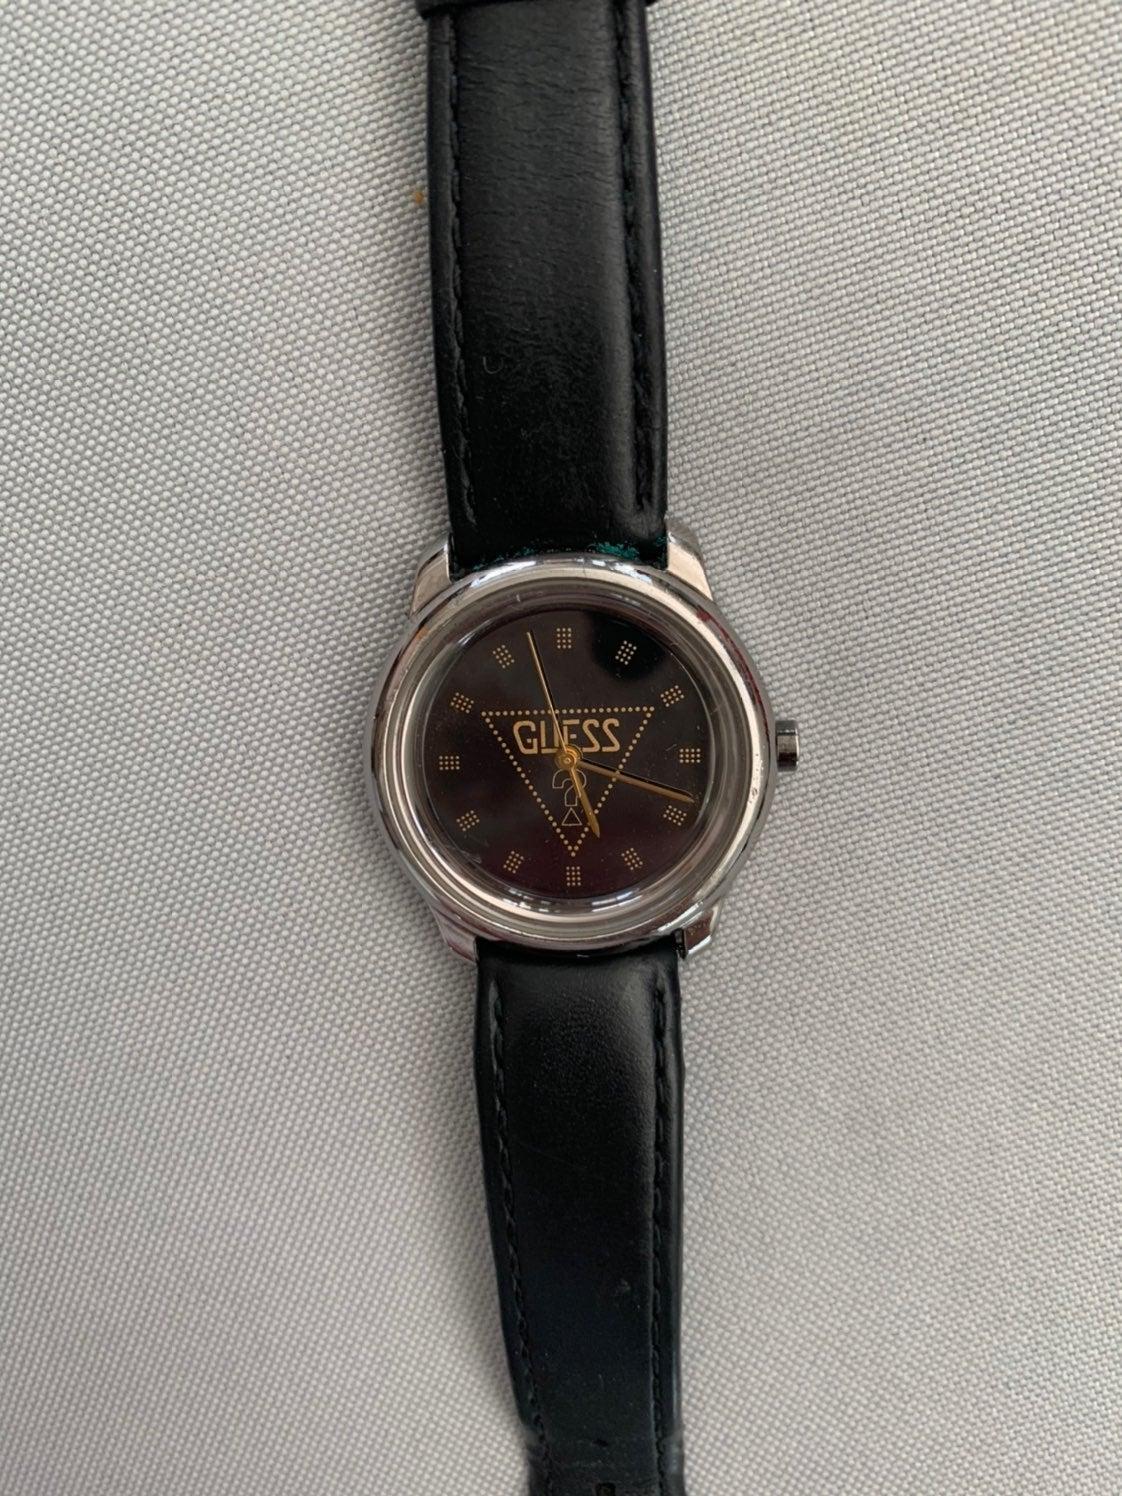 Unisex GUESS Watch